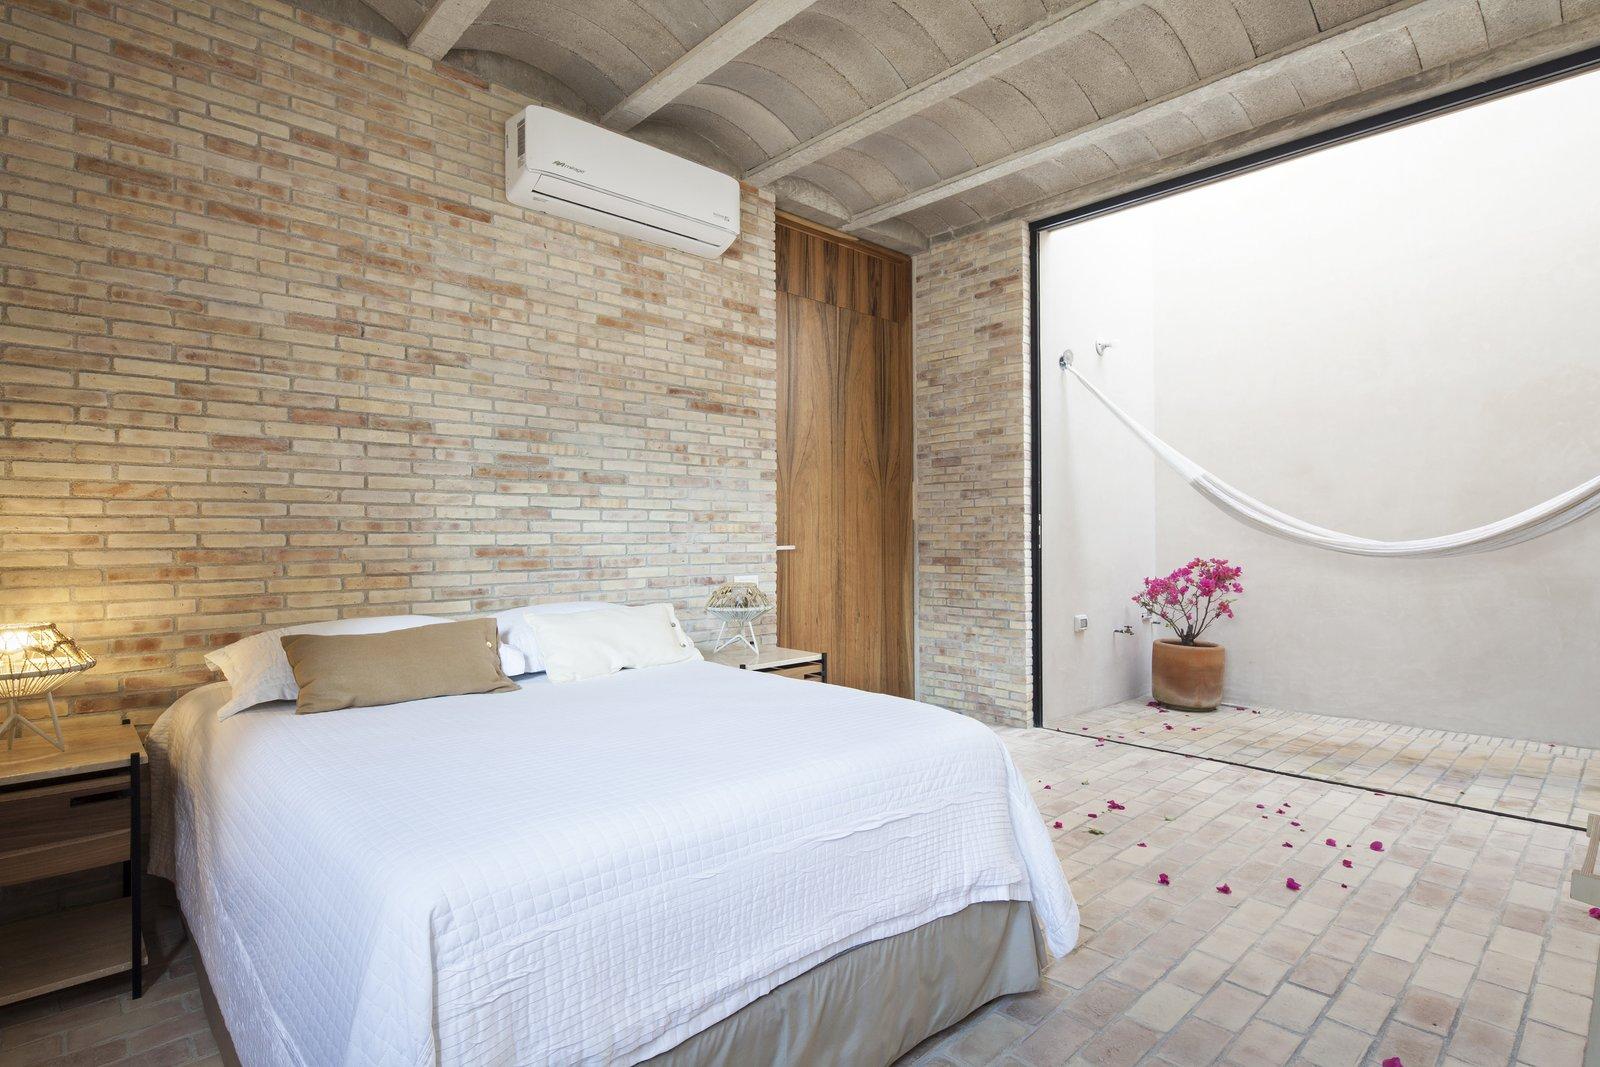 Outdoor and Small Patio, Porch, Deck Bedroom.  Casa Iguana by OBRA BLANCA